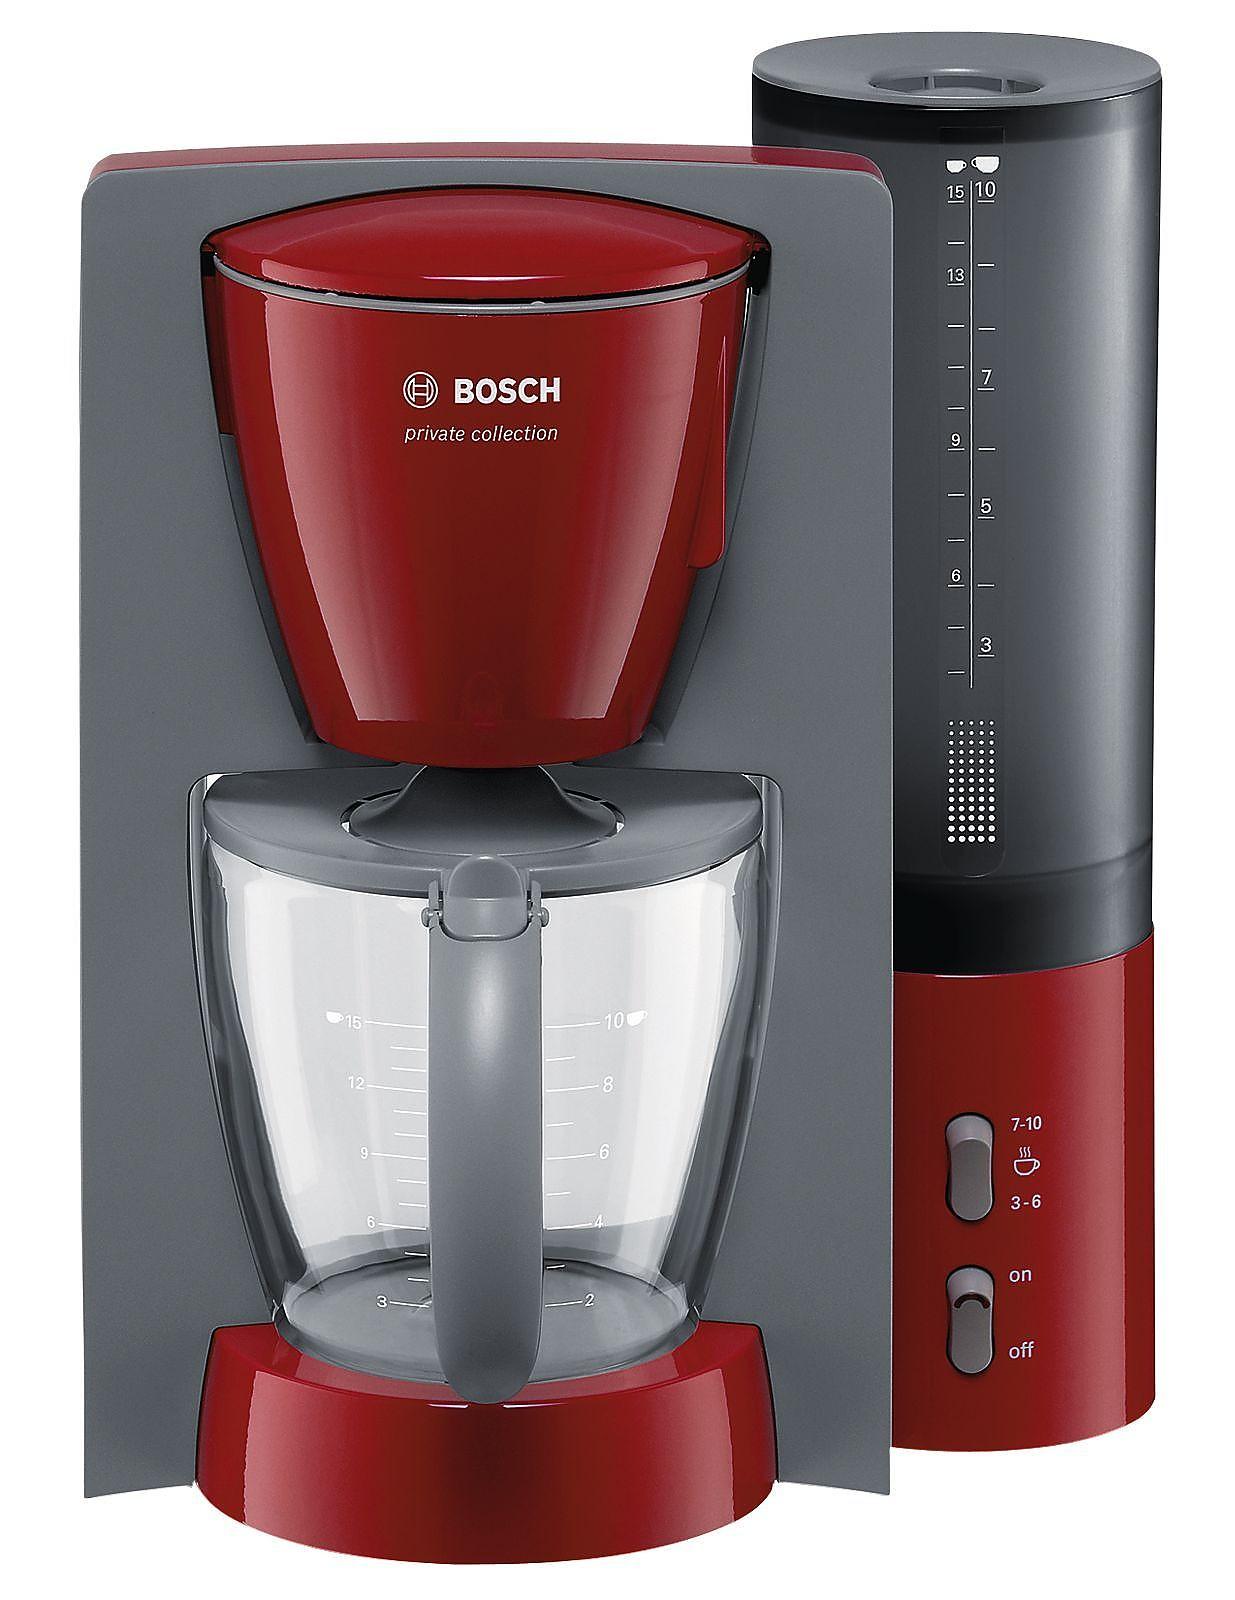 tka6024v rot grau bosch elektro klein filter kaffeemaschinen. Black Bedroom Furniture Sets. Home Design Ideas